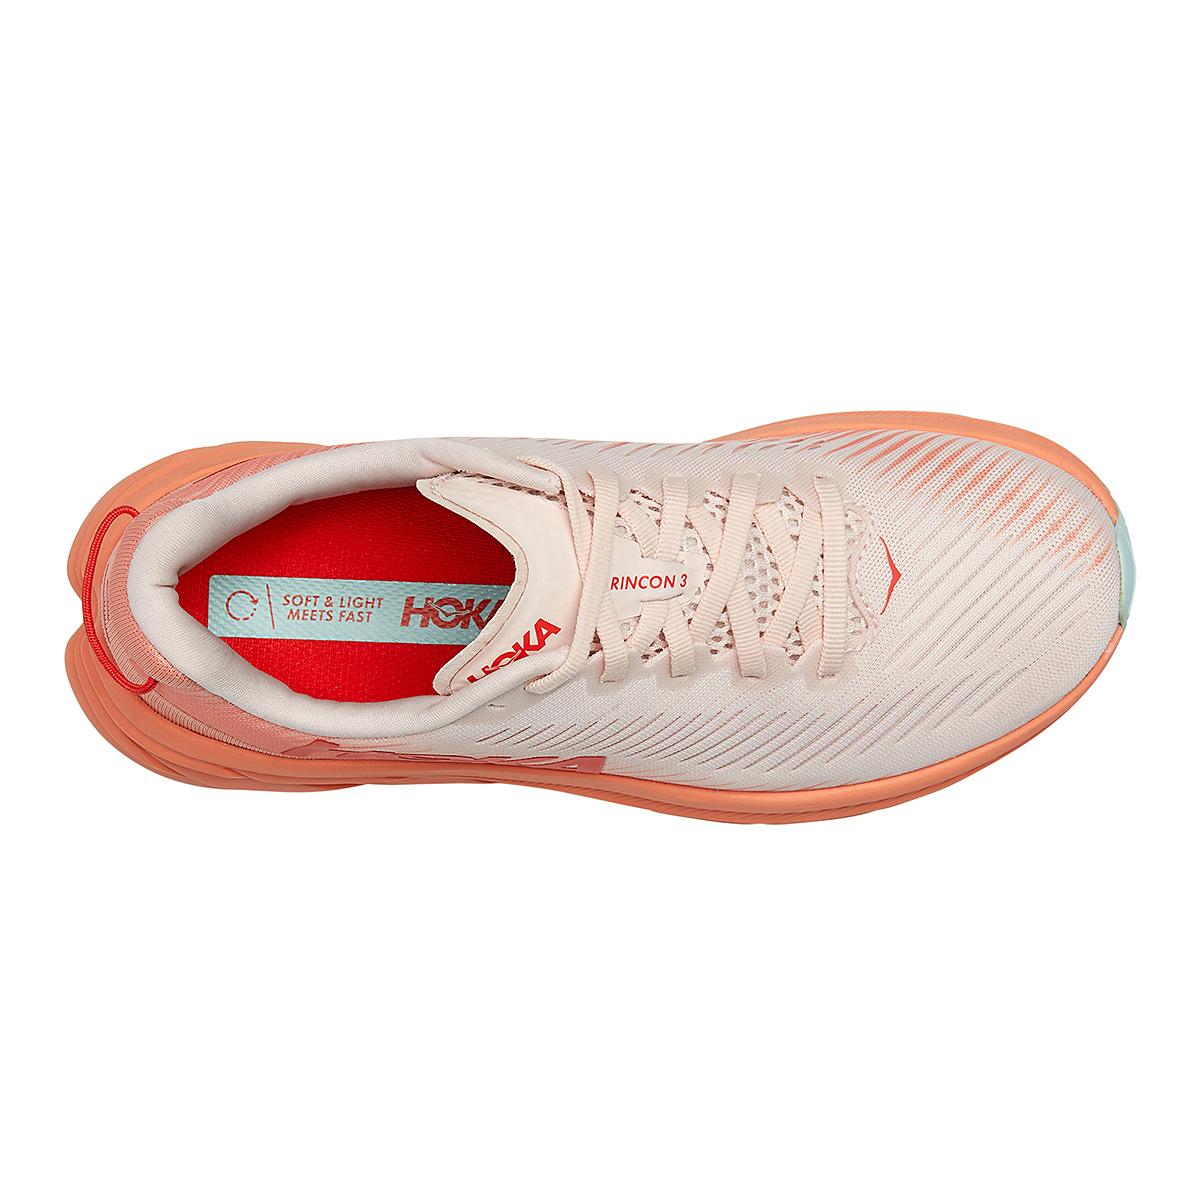 Women's Hoka One One Rincon 3 Running Shoe - Color: Silver Peony/Cantaloupe - Size: 5 - Width: Regular, Silver Peony/Cantaloupe, large, image 5